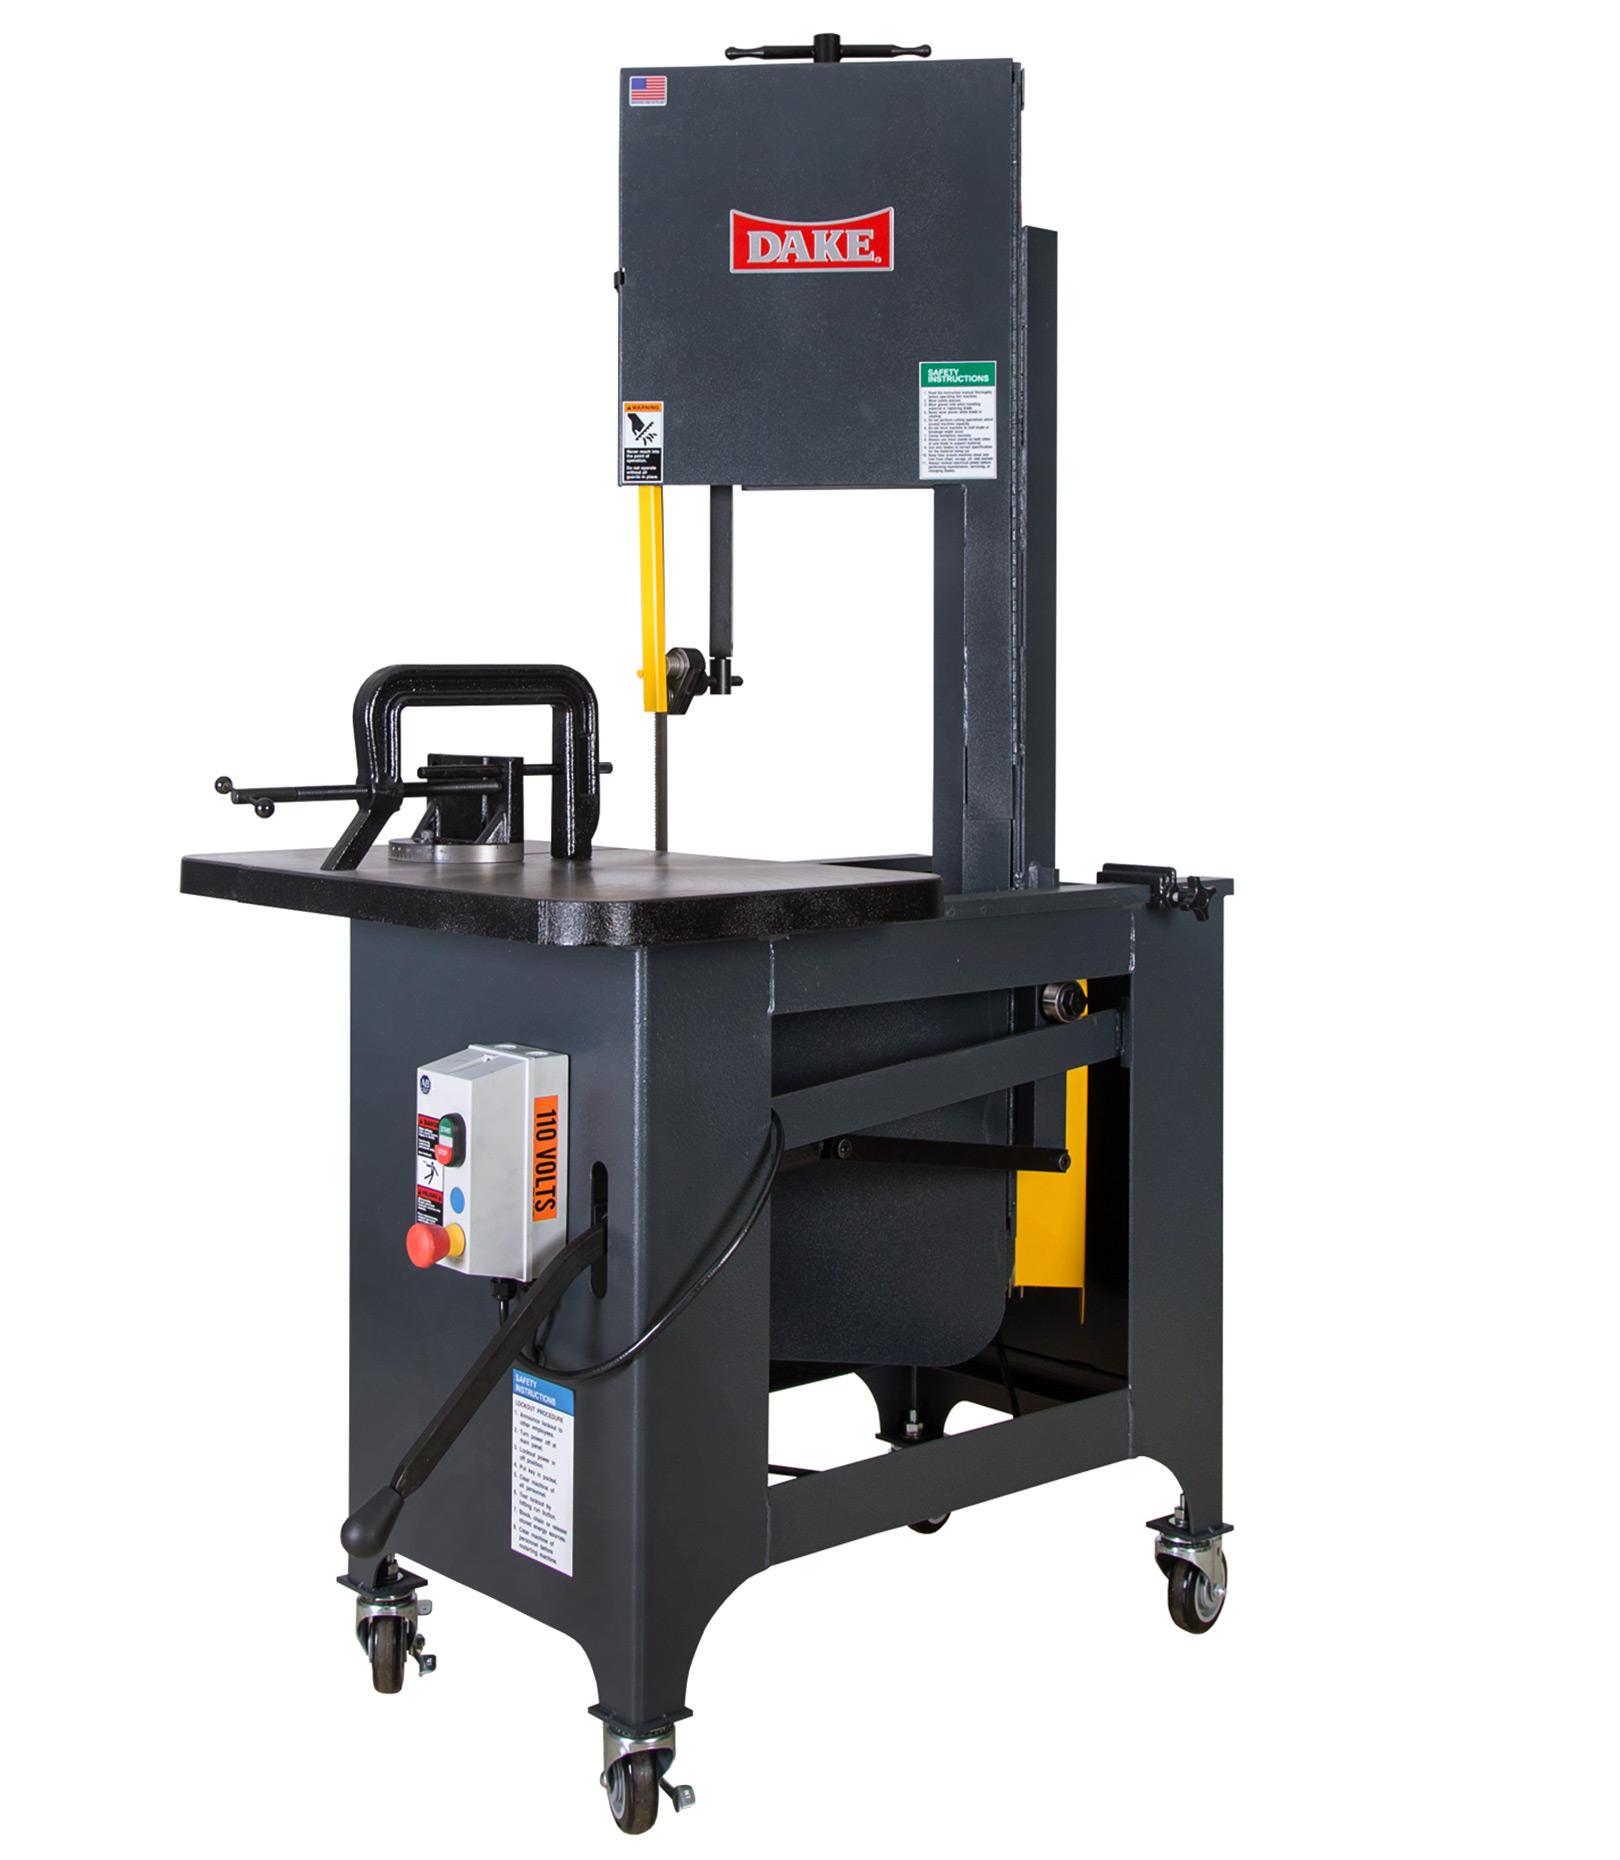 Metal Cutting Bench Saw Vertical Kaka Industrial Bs Rikon 14 Inch Bandsaw Essie Ramco